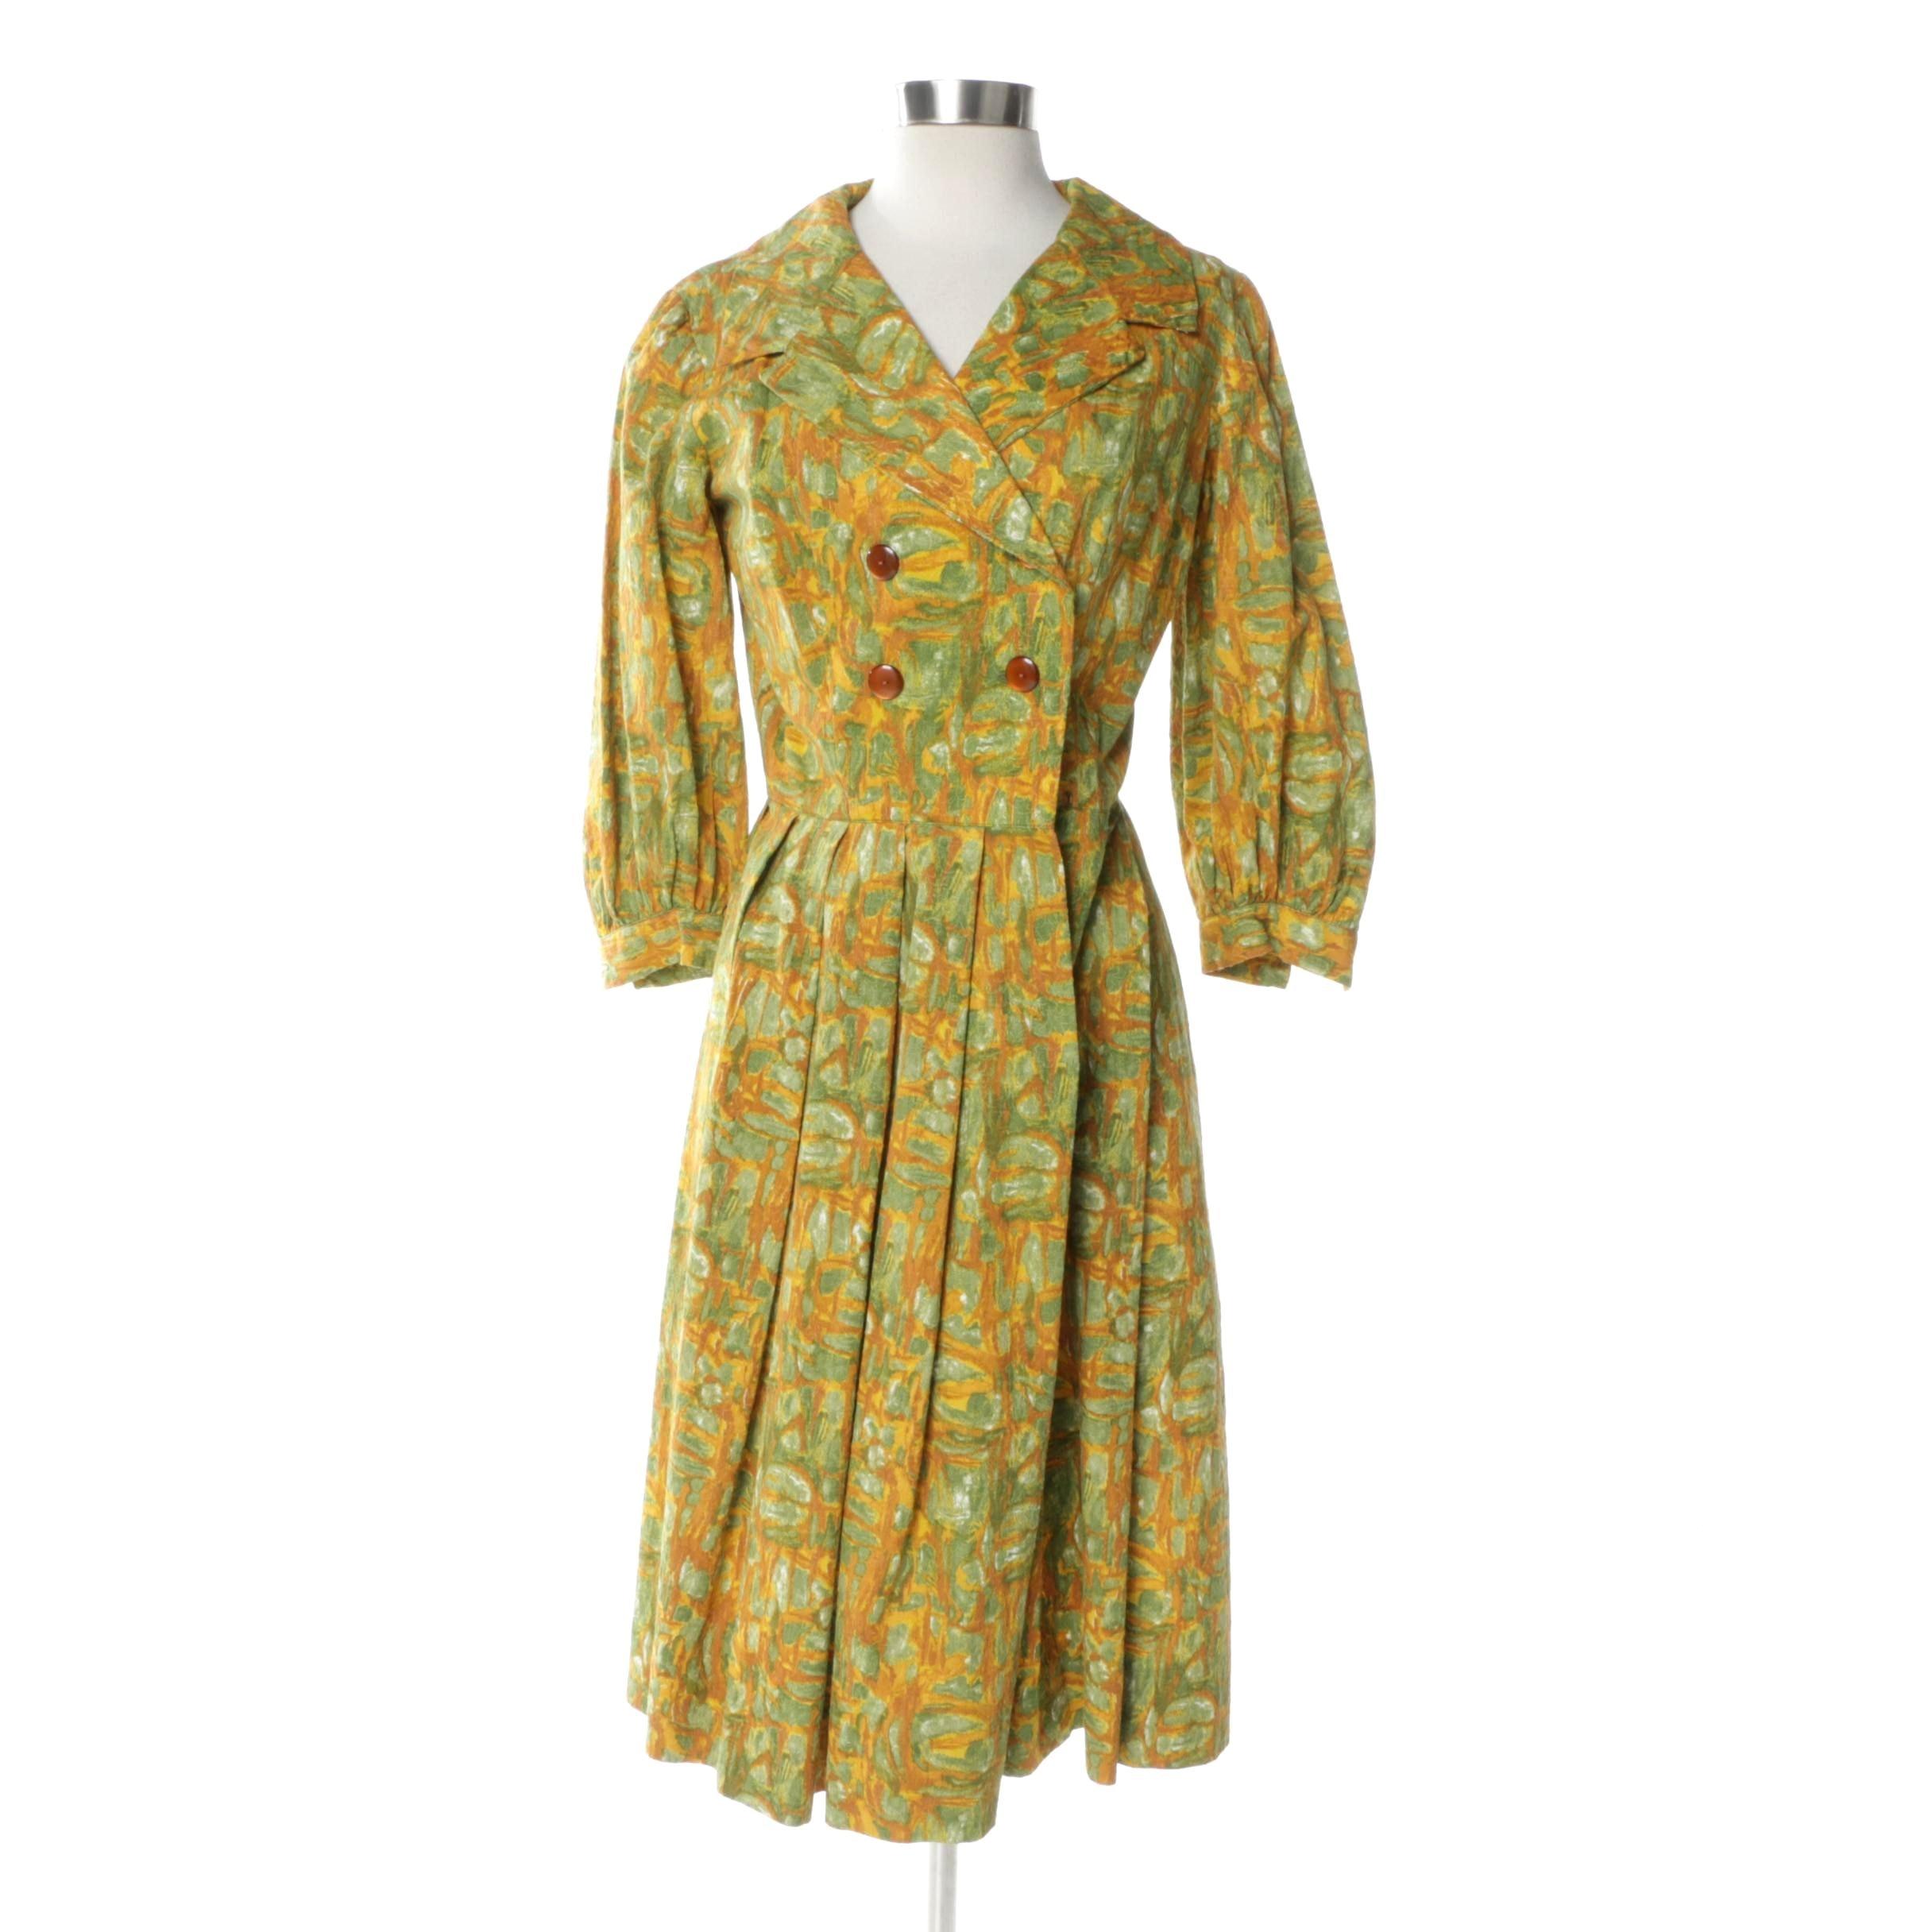 1950s Yellow Printed Jaquard Cocktail Dress